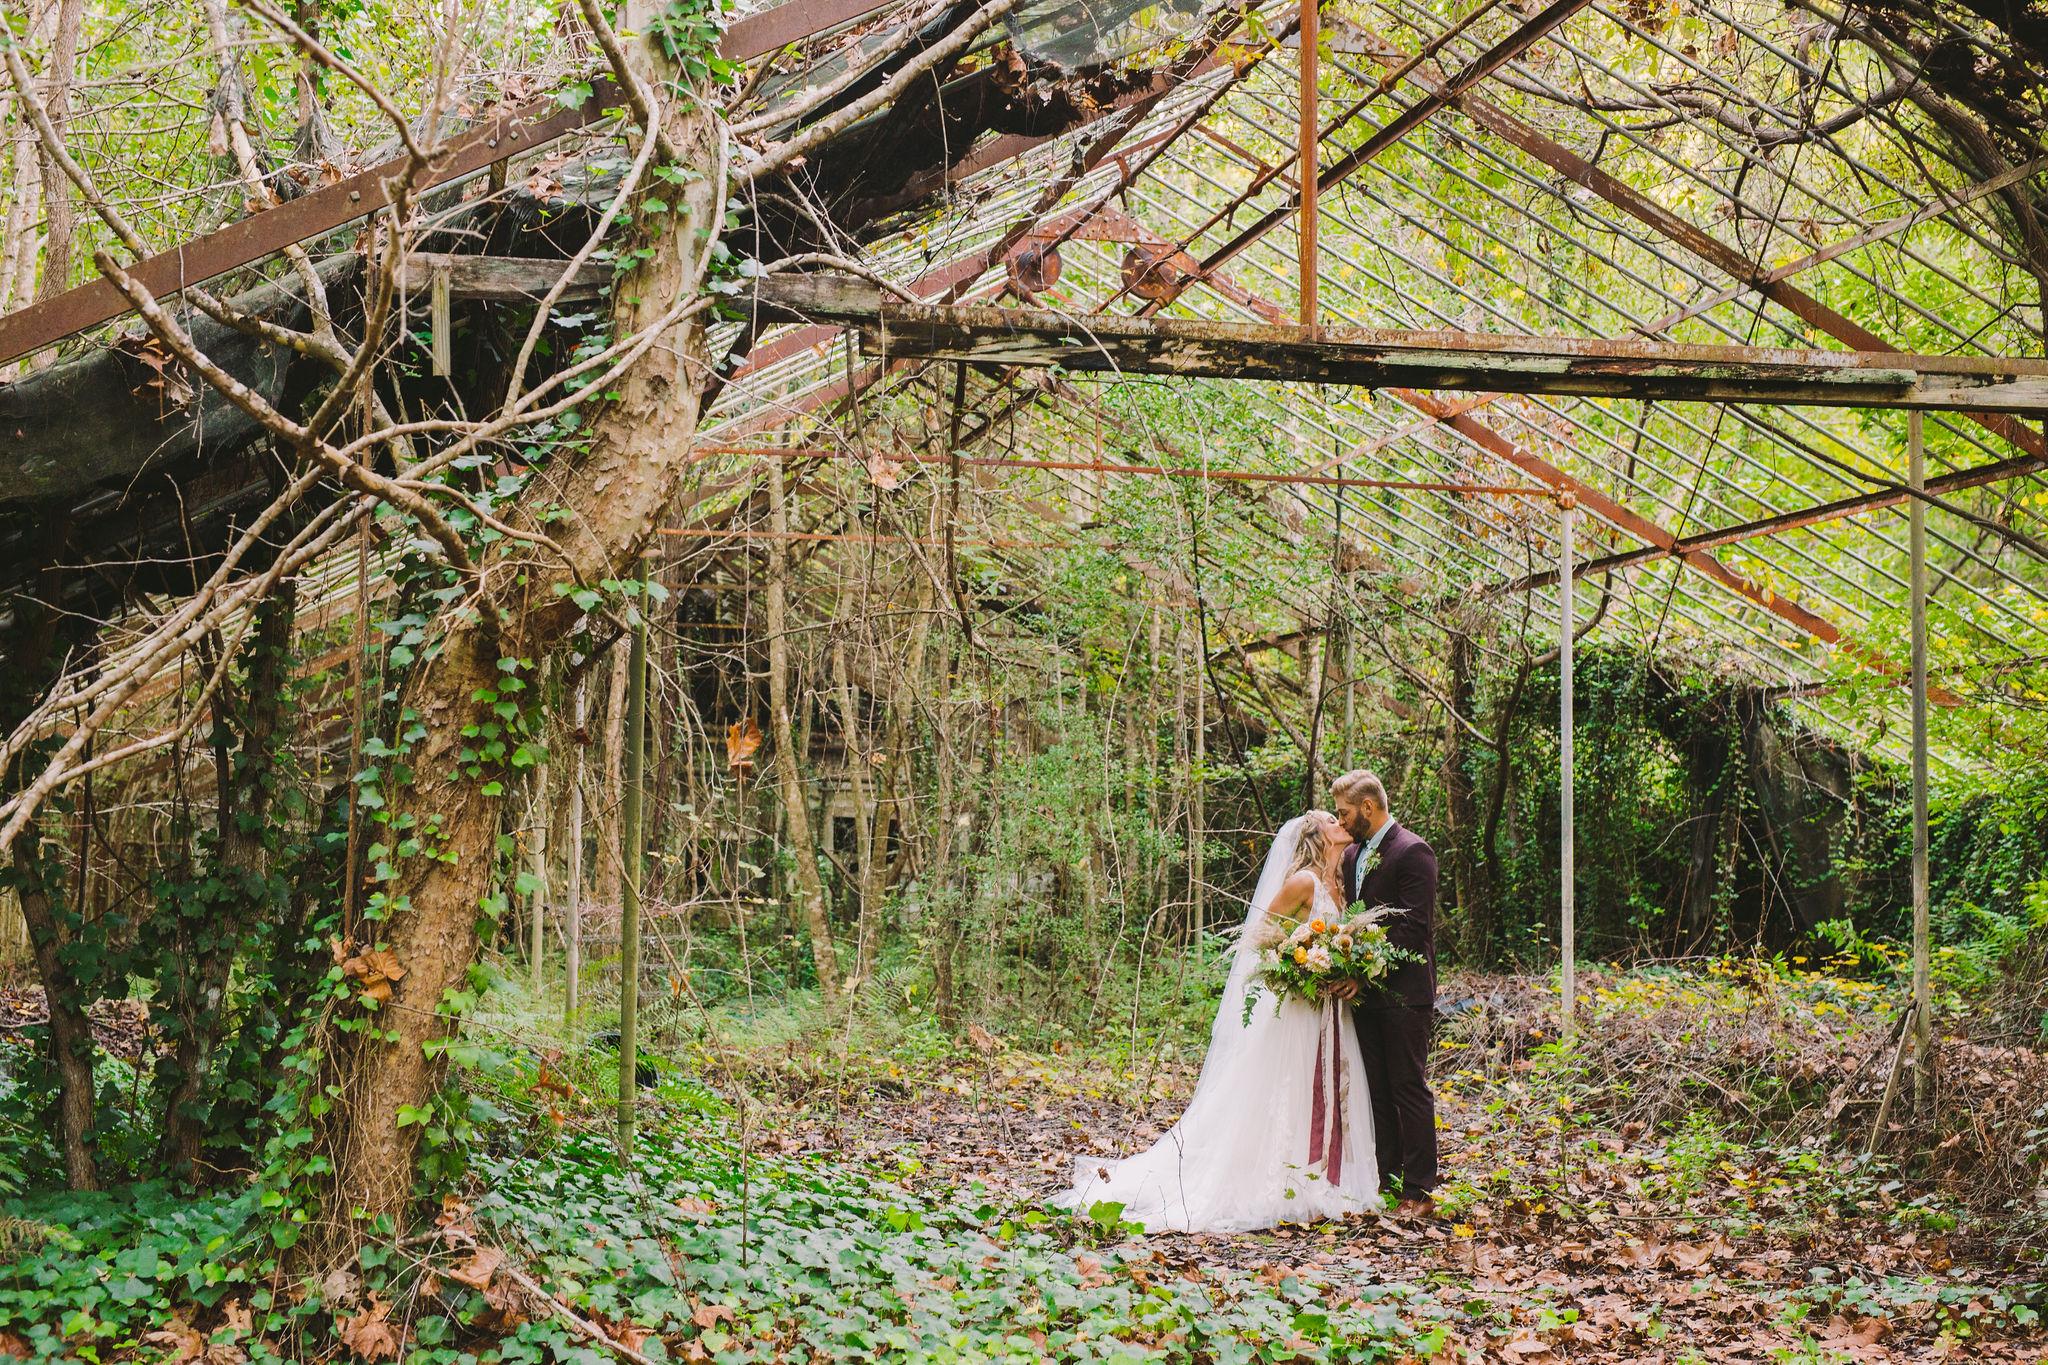 Jesseandlex_181103_AlexisNate_Wedding_BrideGroom_105.jpg